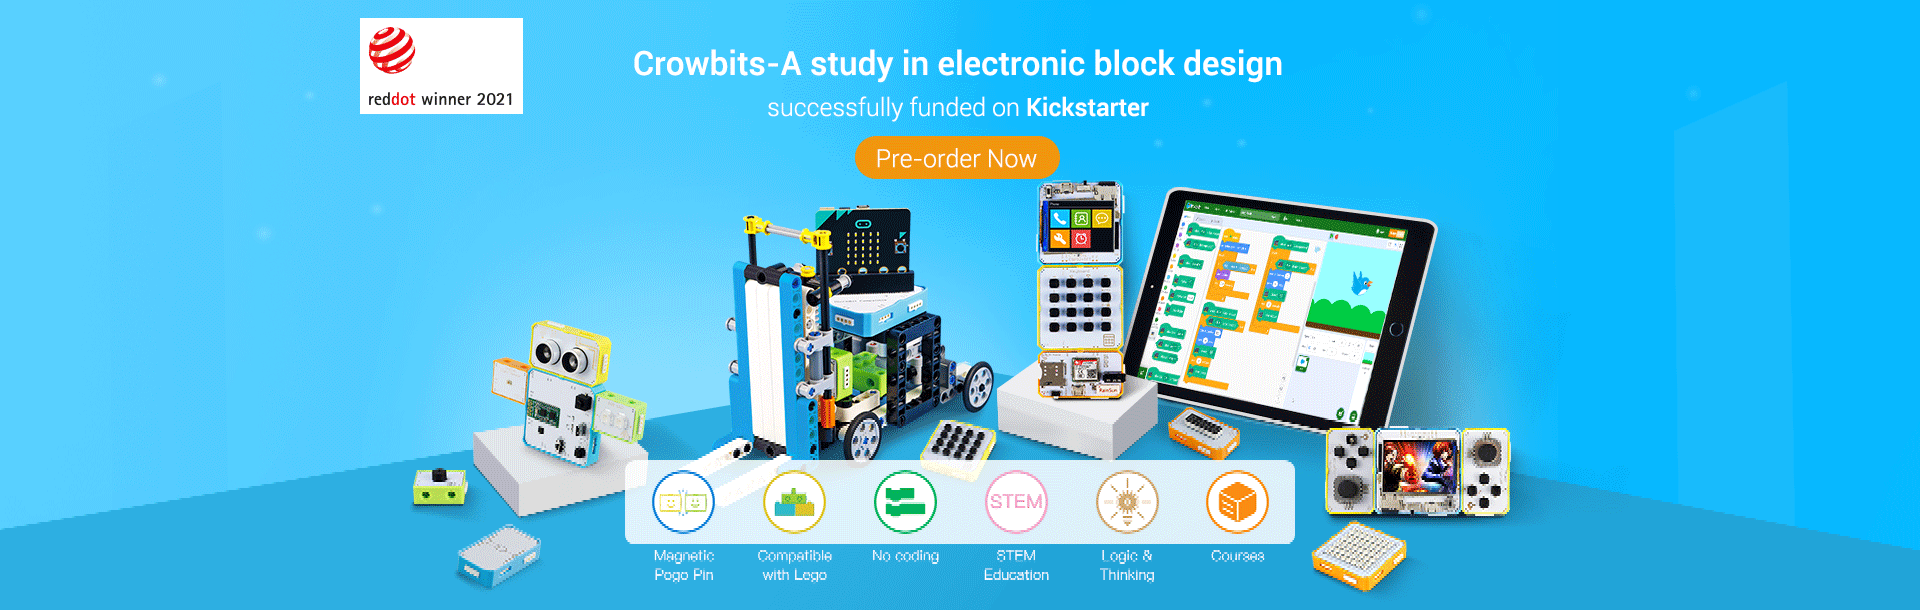 https://www.elecrow.com/crowbits-kit.html